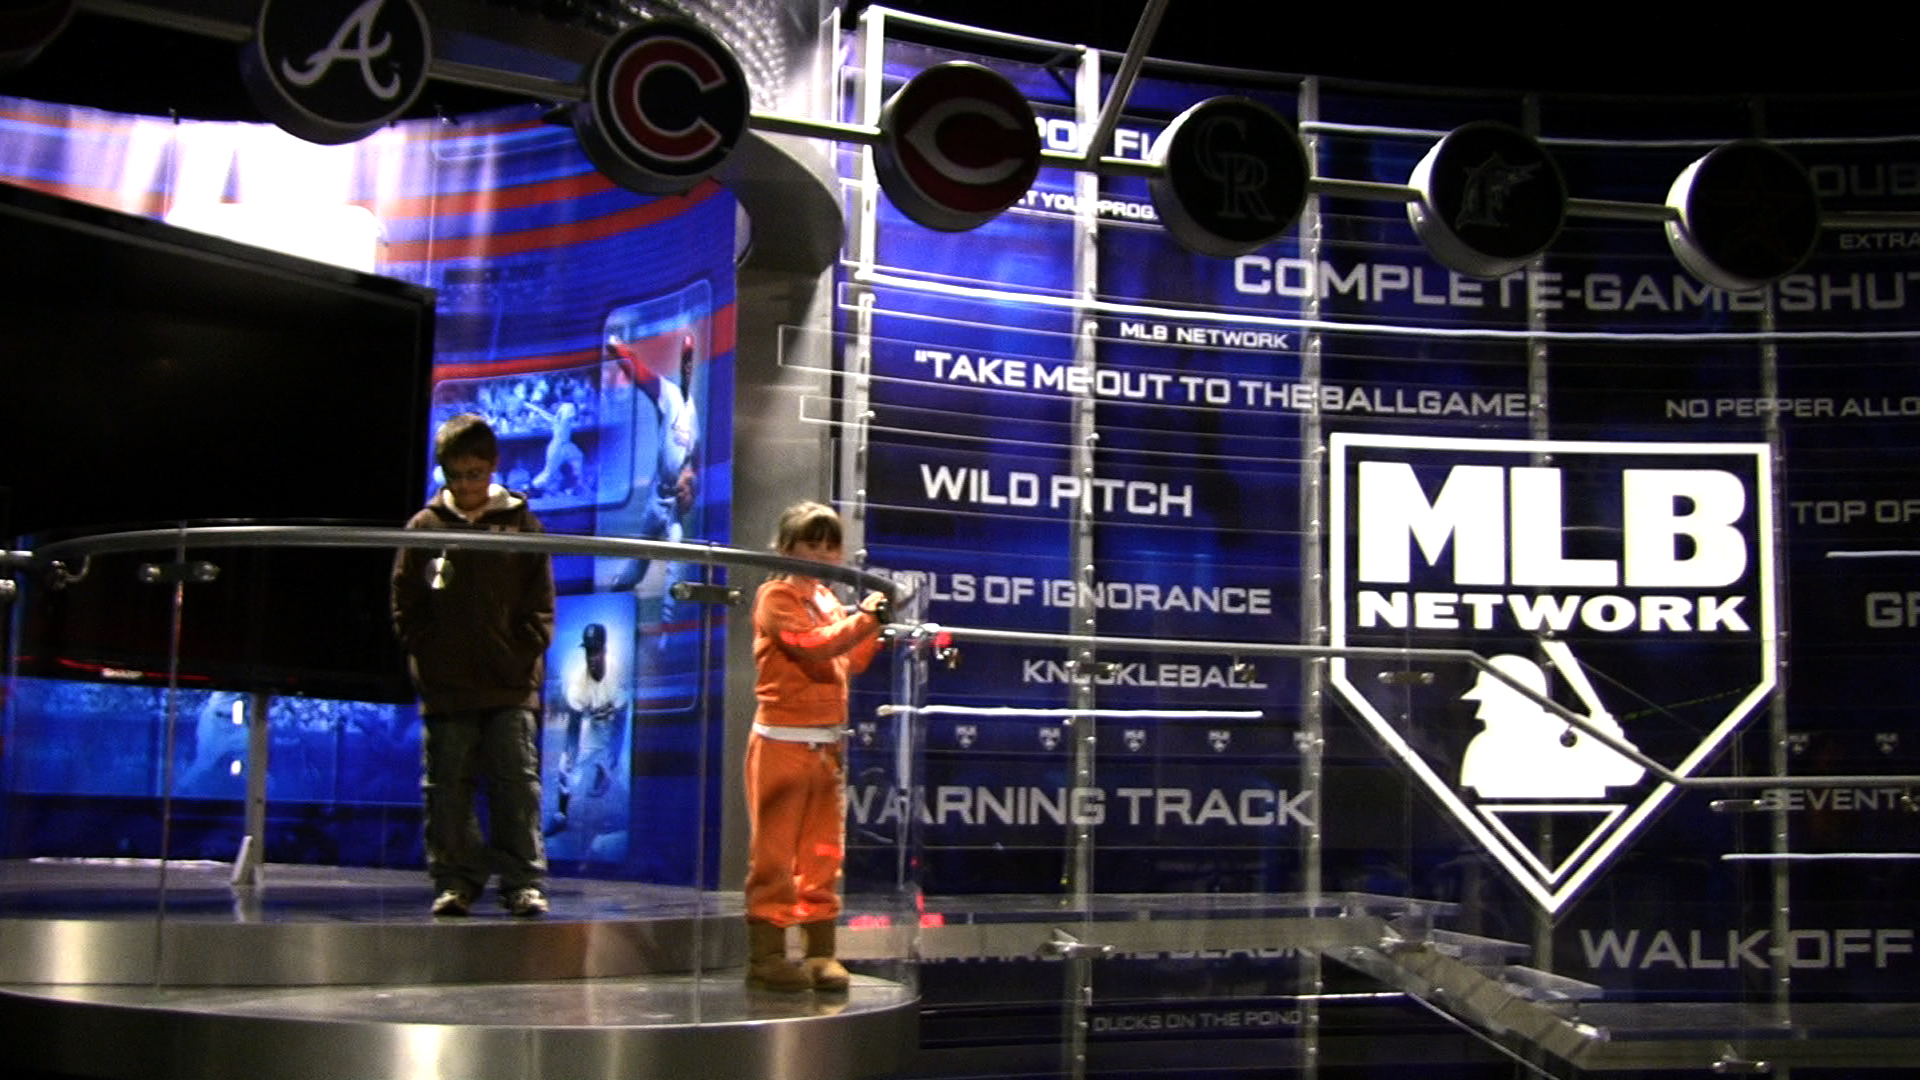 Kids at MLB Network 3.jpg